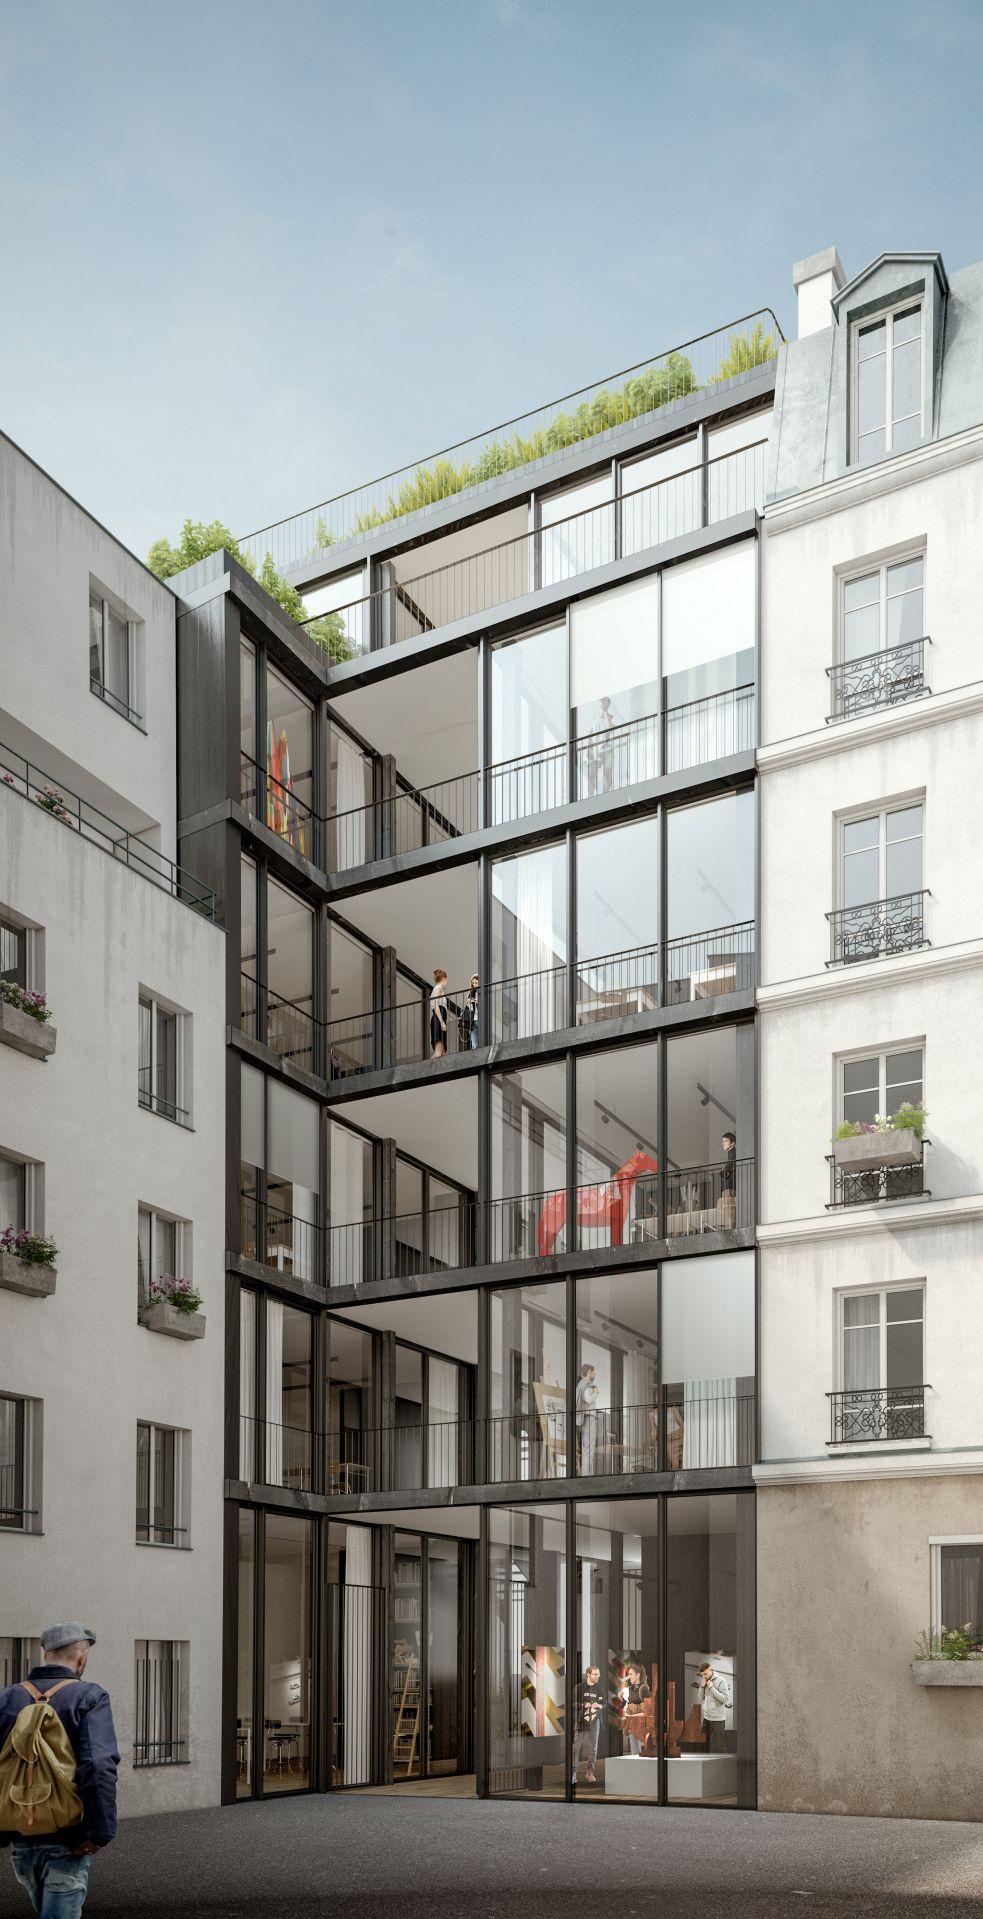 Supervue la architectures eqt pepiniere artisanale rue bisson bMedium